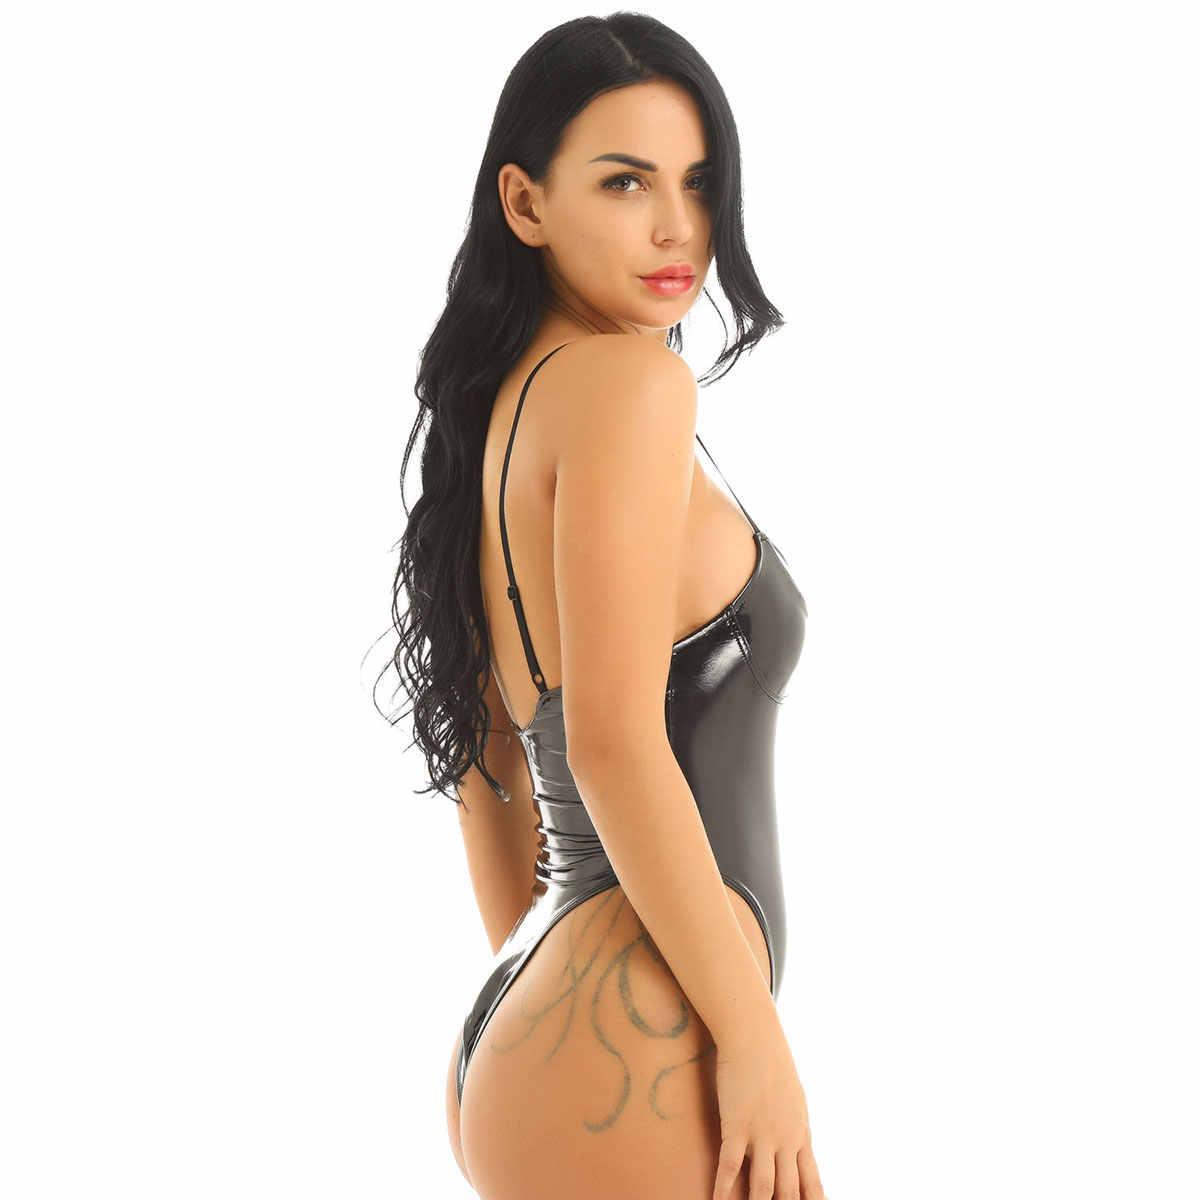 TiaoBug Vrouwen Zwart Lakleer Push Up Cup Hoge Cut Thong Hot Sexy Bodysuit Verstelbare Bandjes Badmode Monokini Badpak